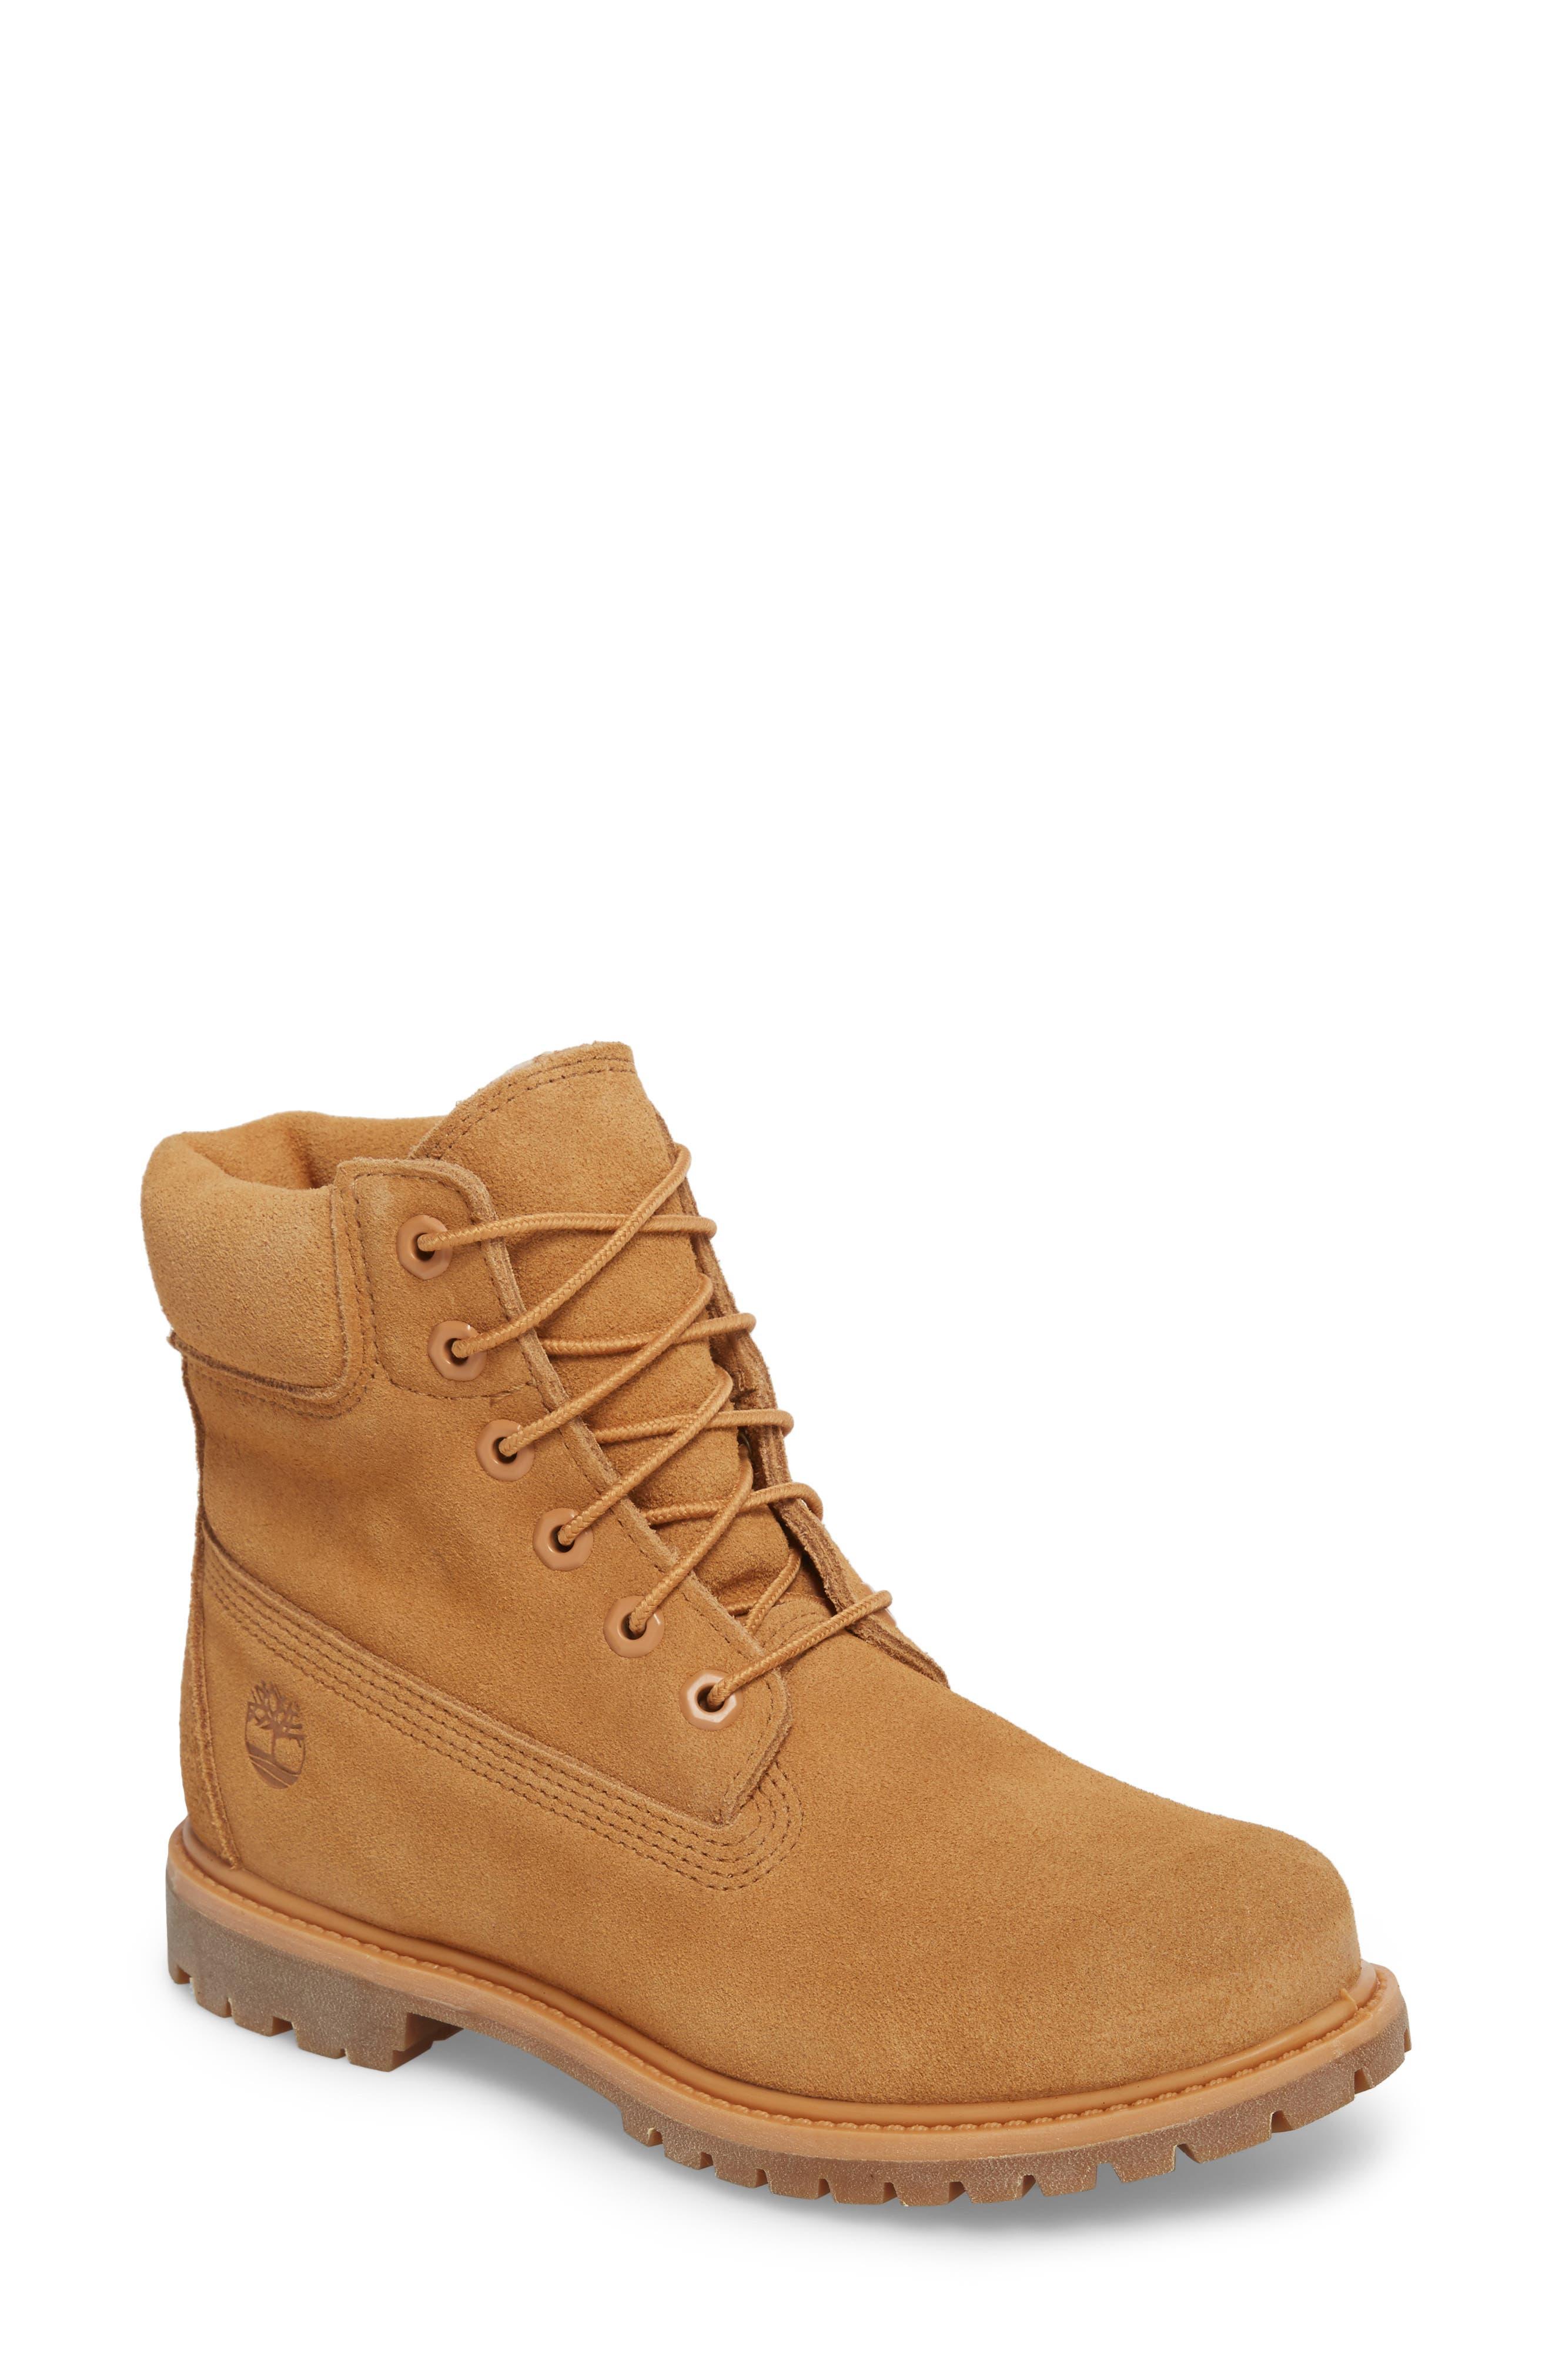 6 Inch Boot,                             Main thumbnail 1, color,                             230